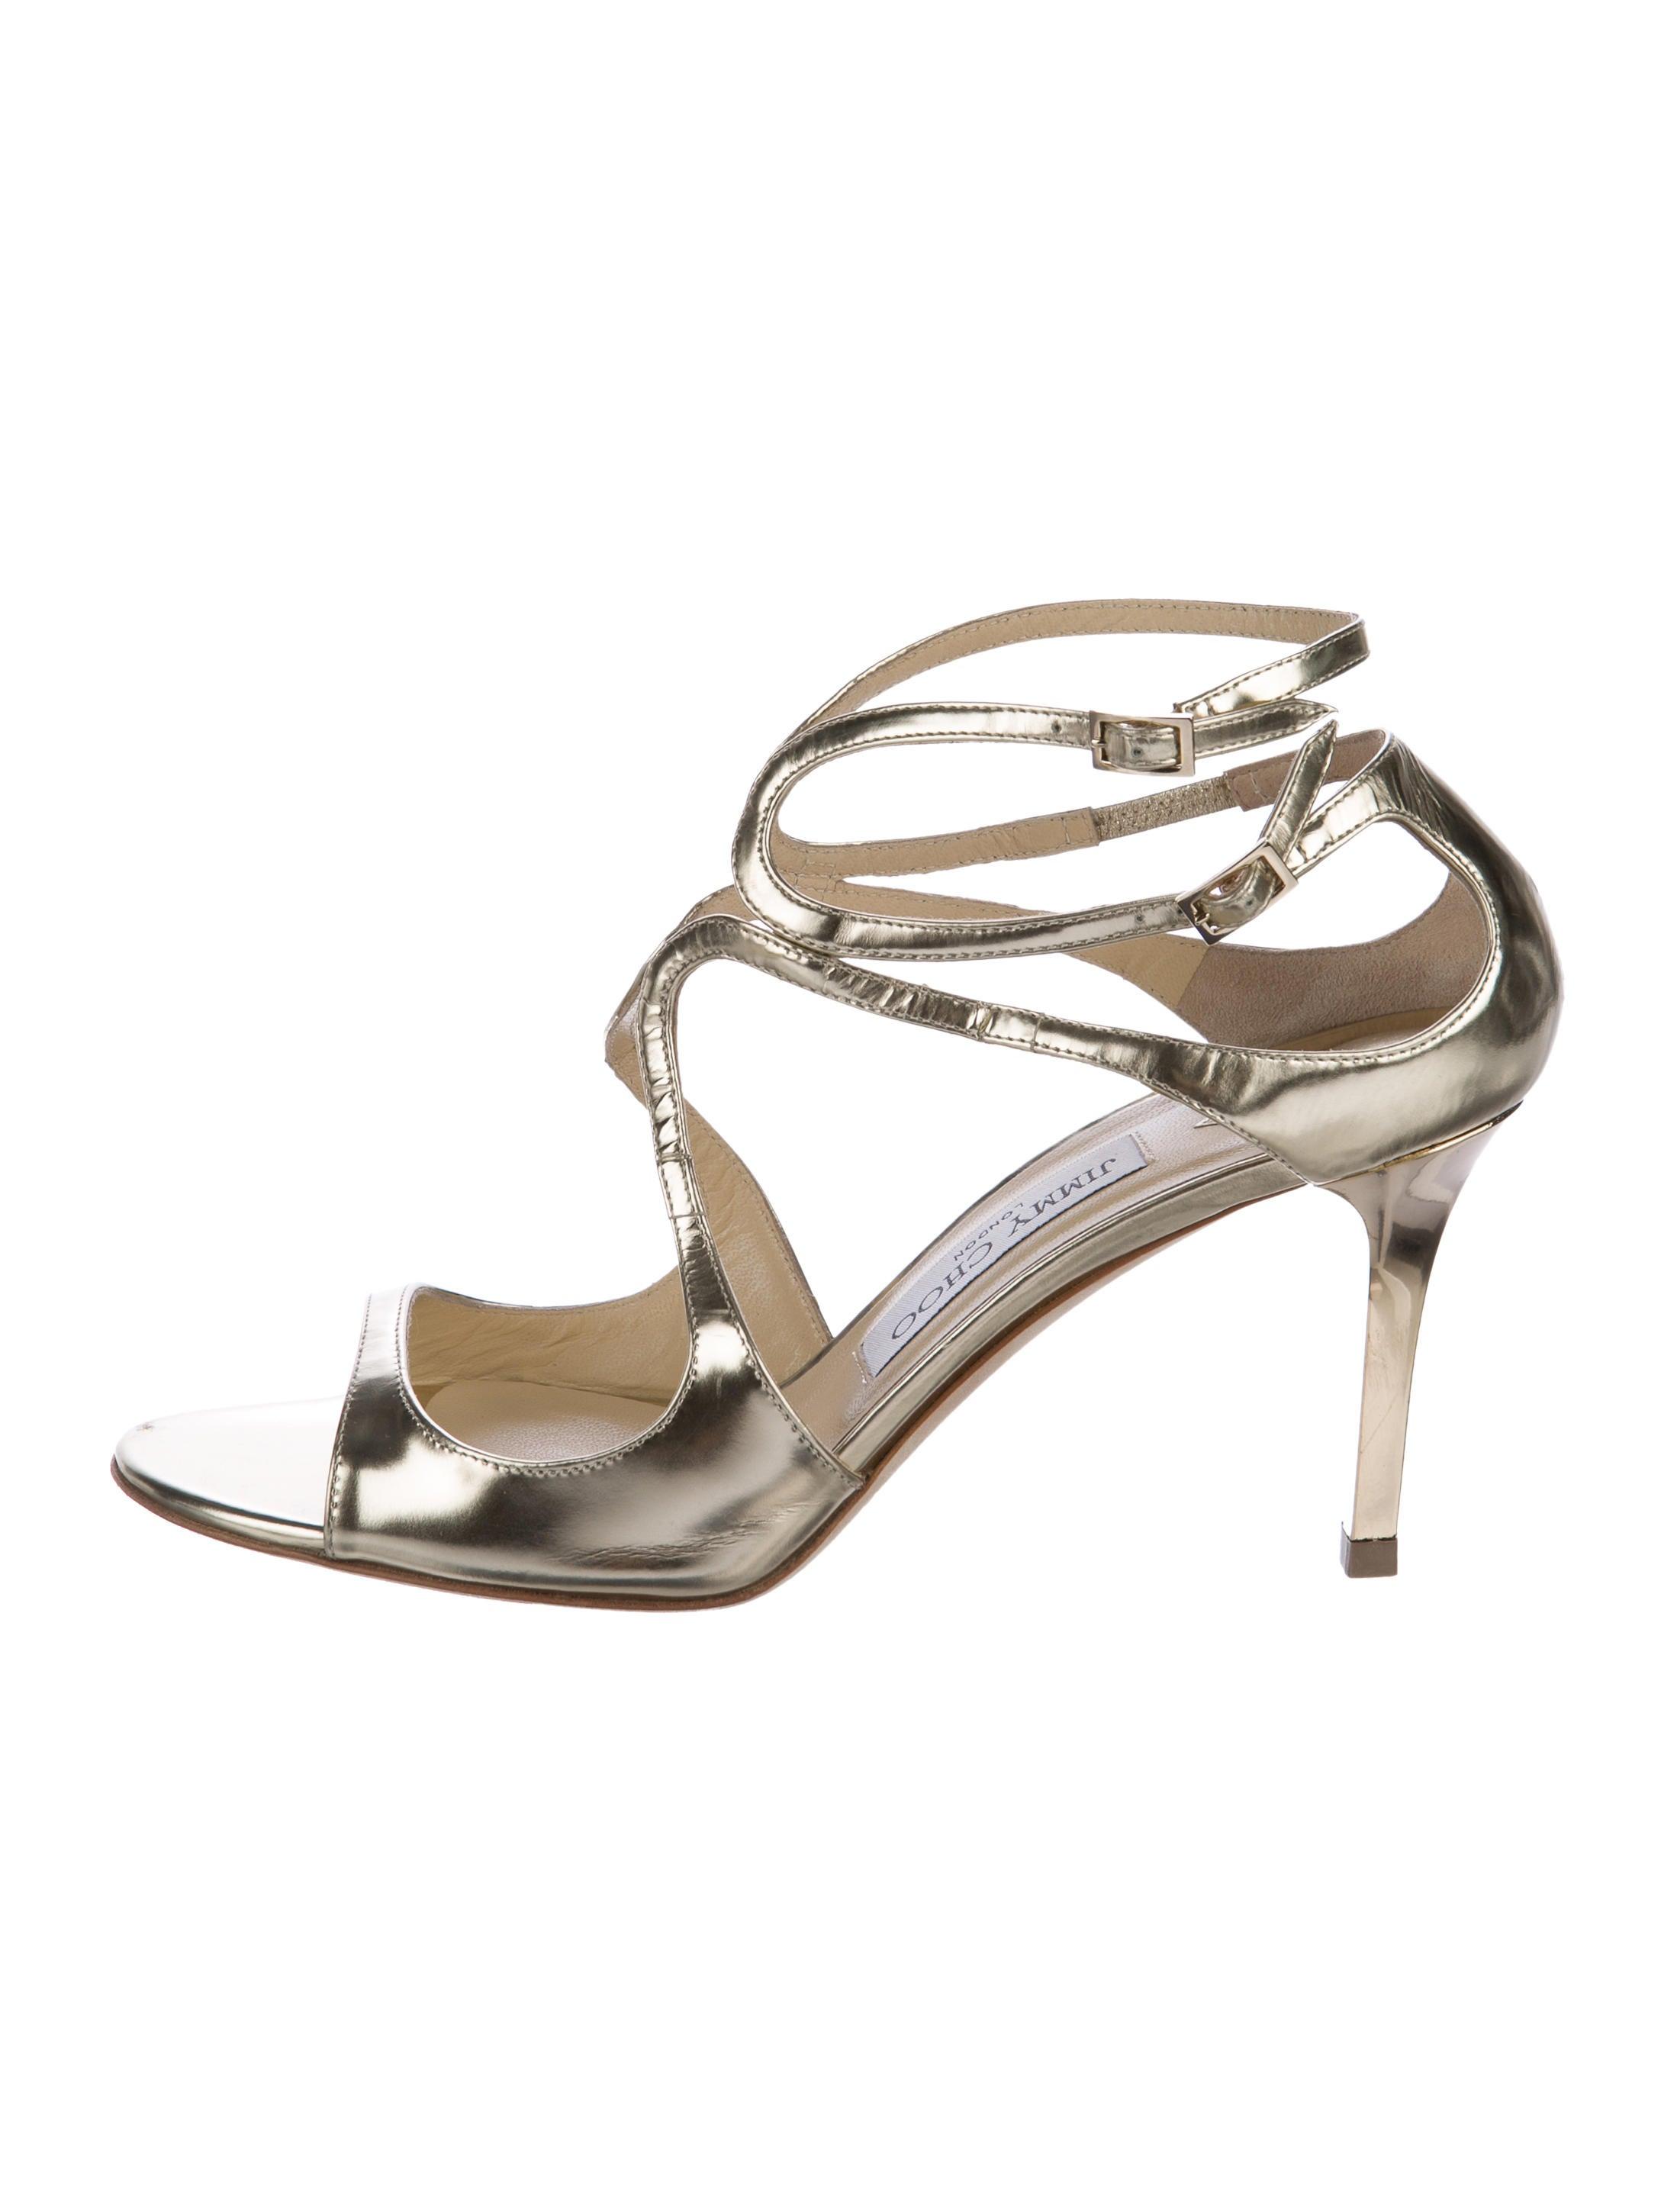 Ivette sandals - Metallic Jimmy Choo London 9HPa199PEq